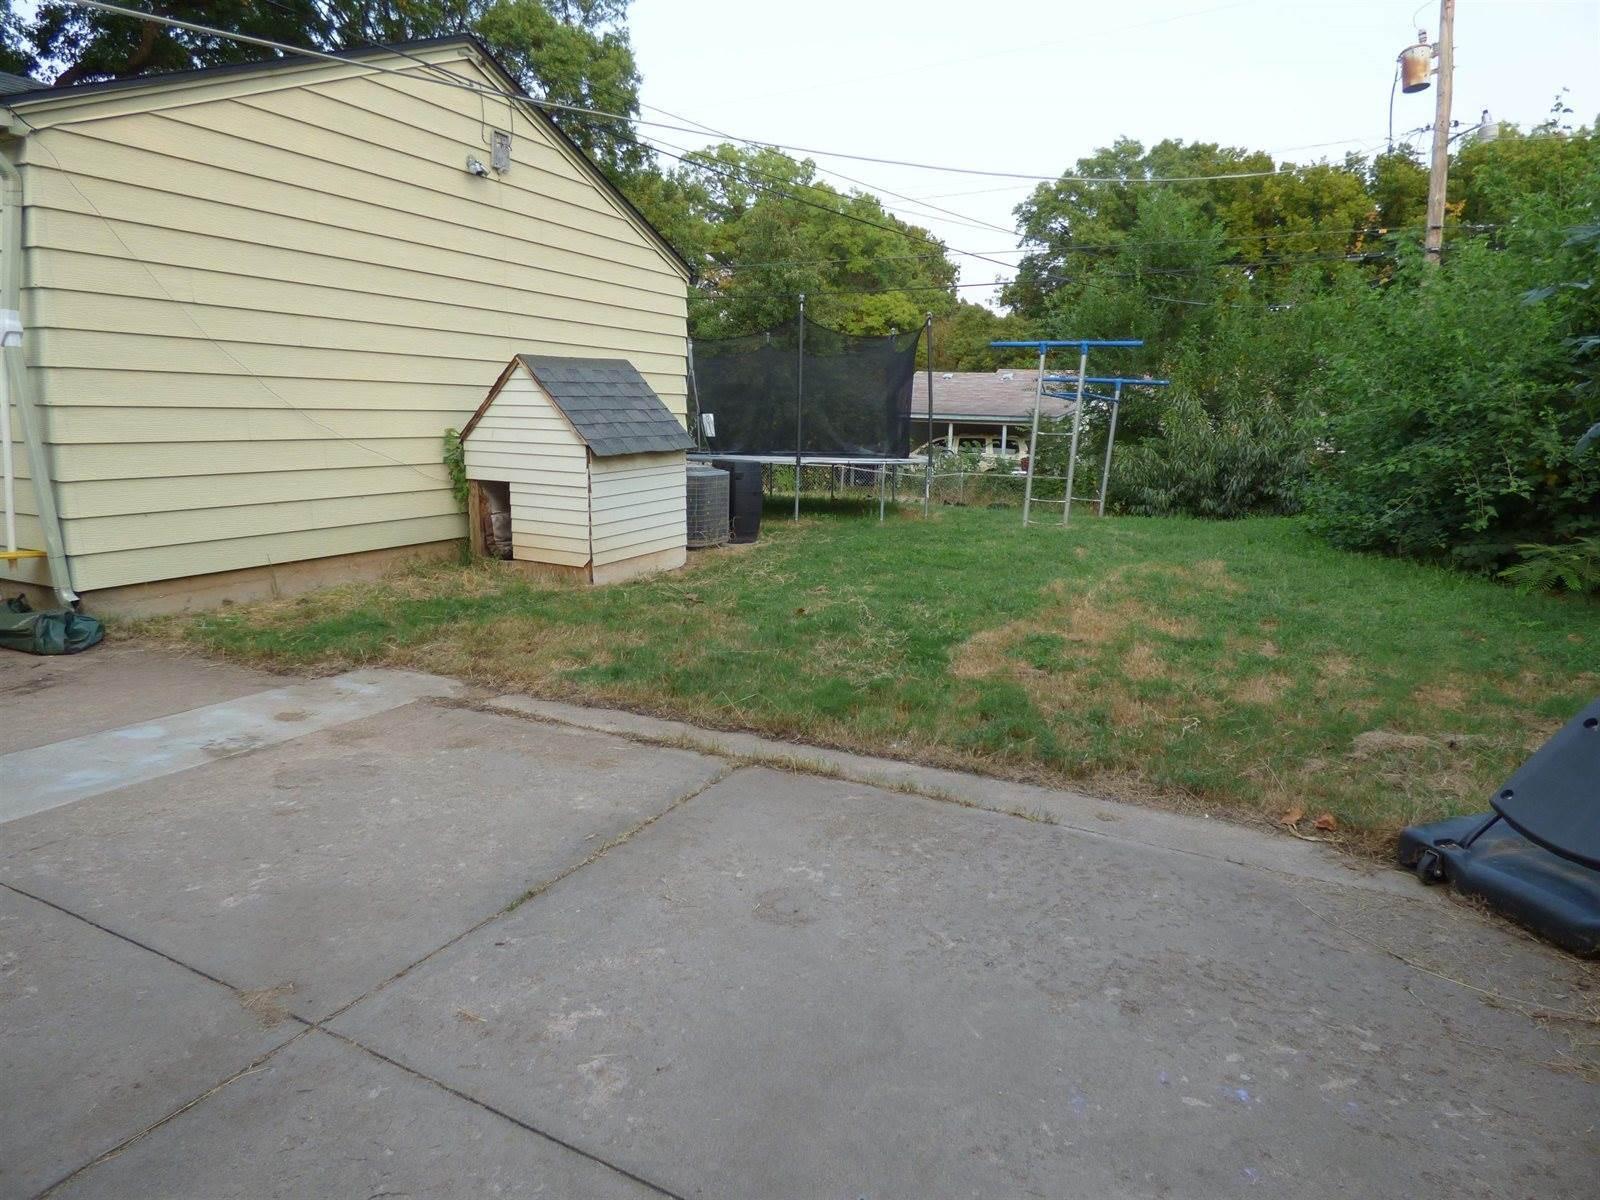 2130 Elpyco, Wichita, KS 67218